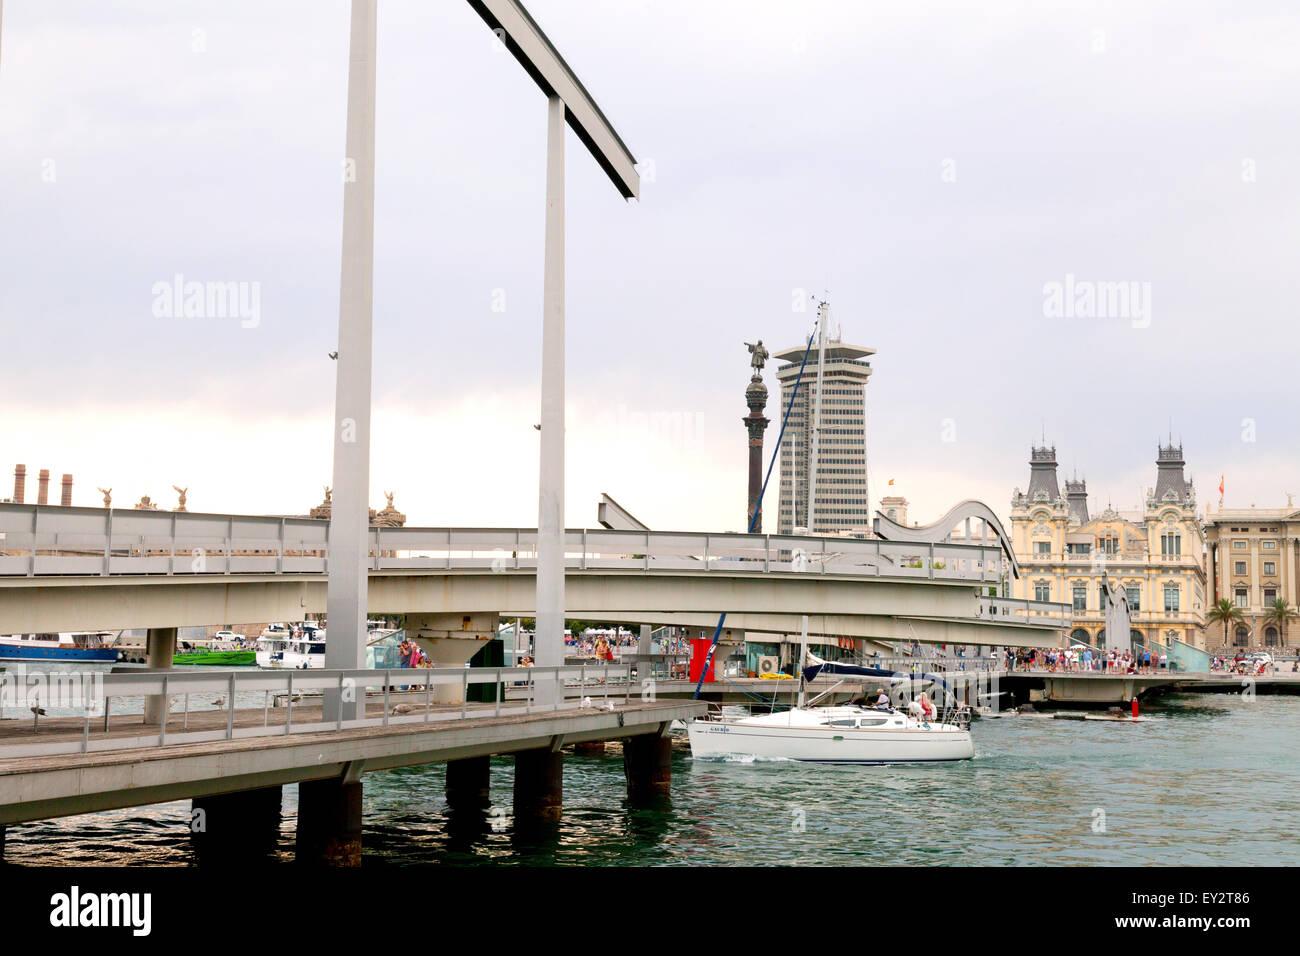 The swing bridge opening to allow a sailboat through, The Rambla de Mar walkway, Port Vell, Barcelona, Spain Europe - Stock Image